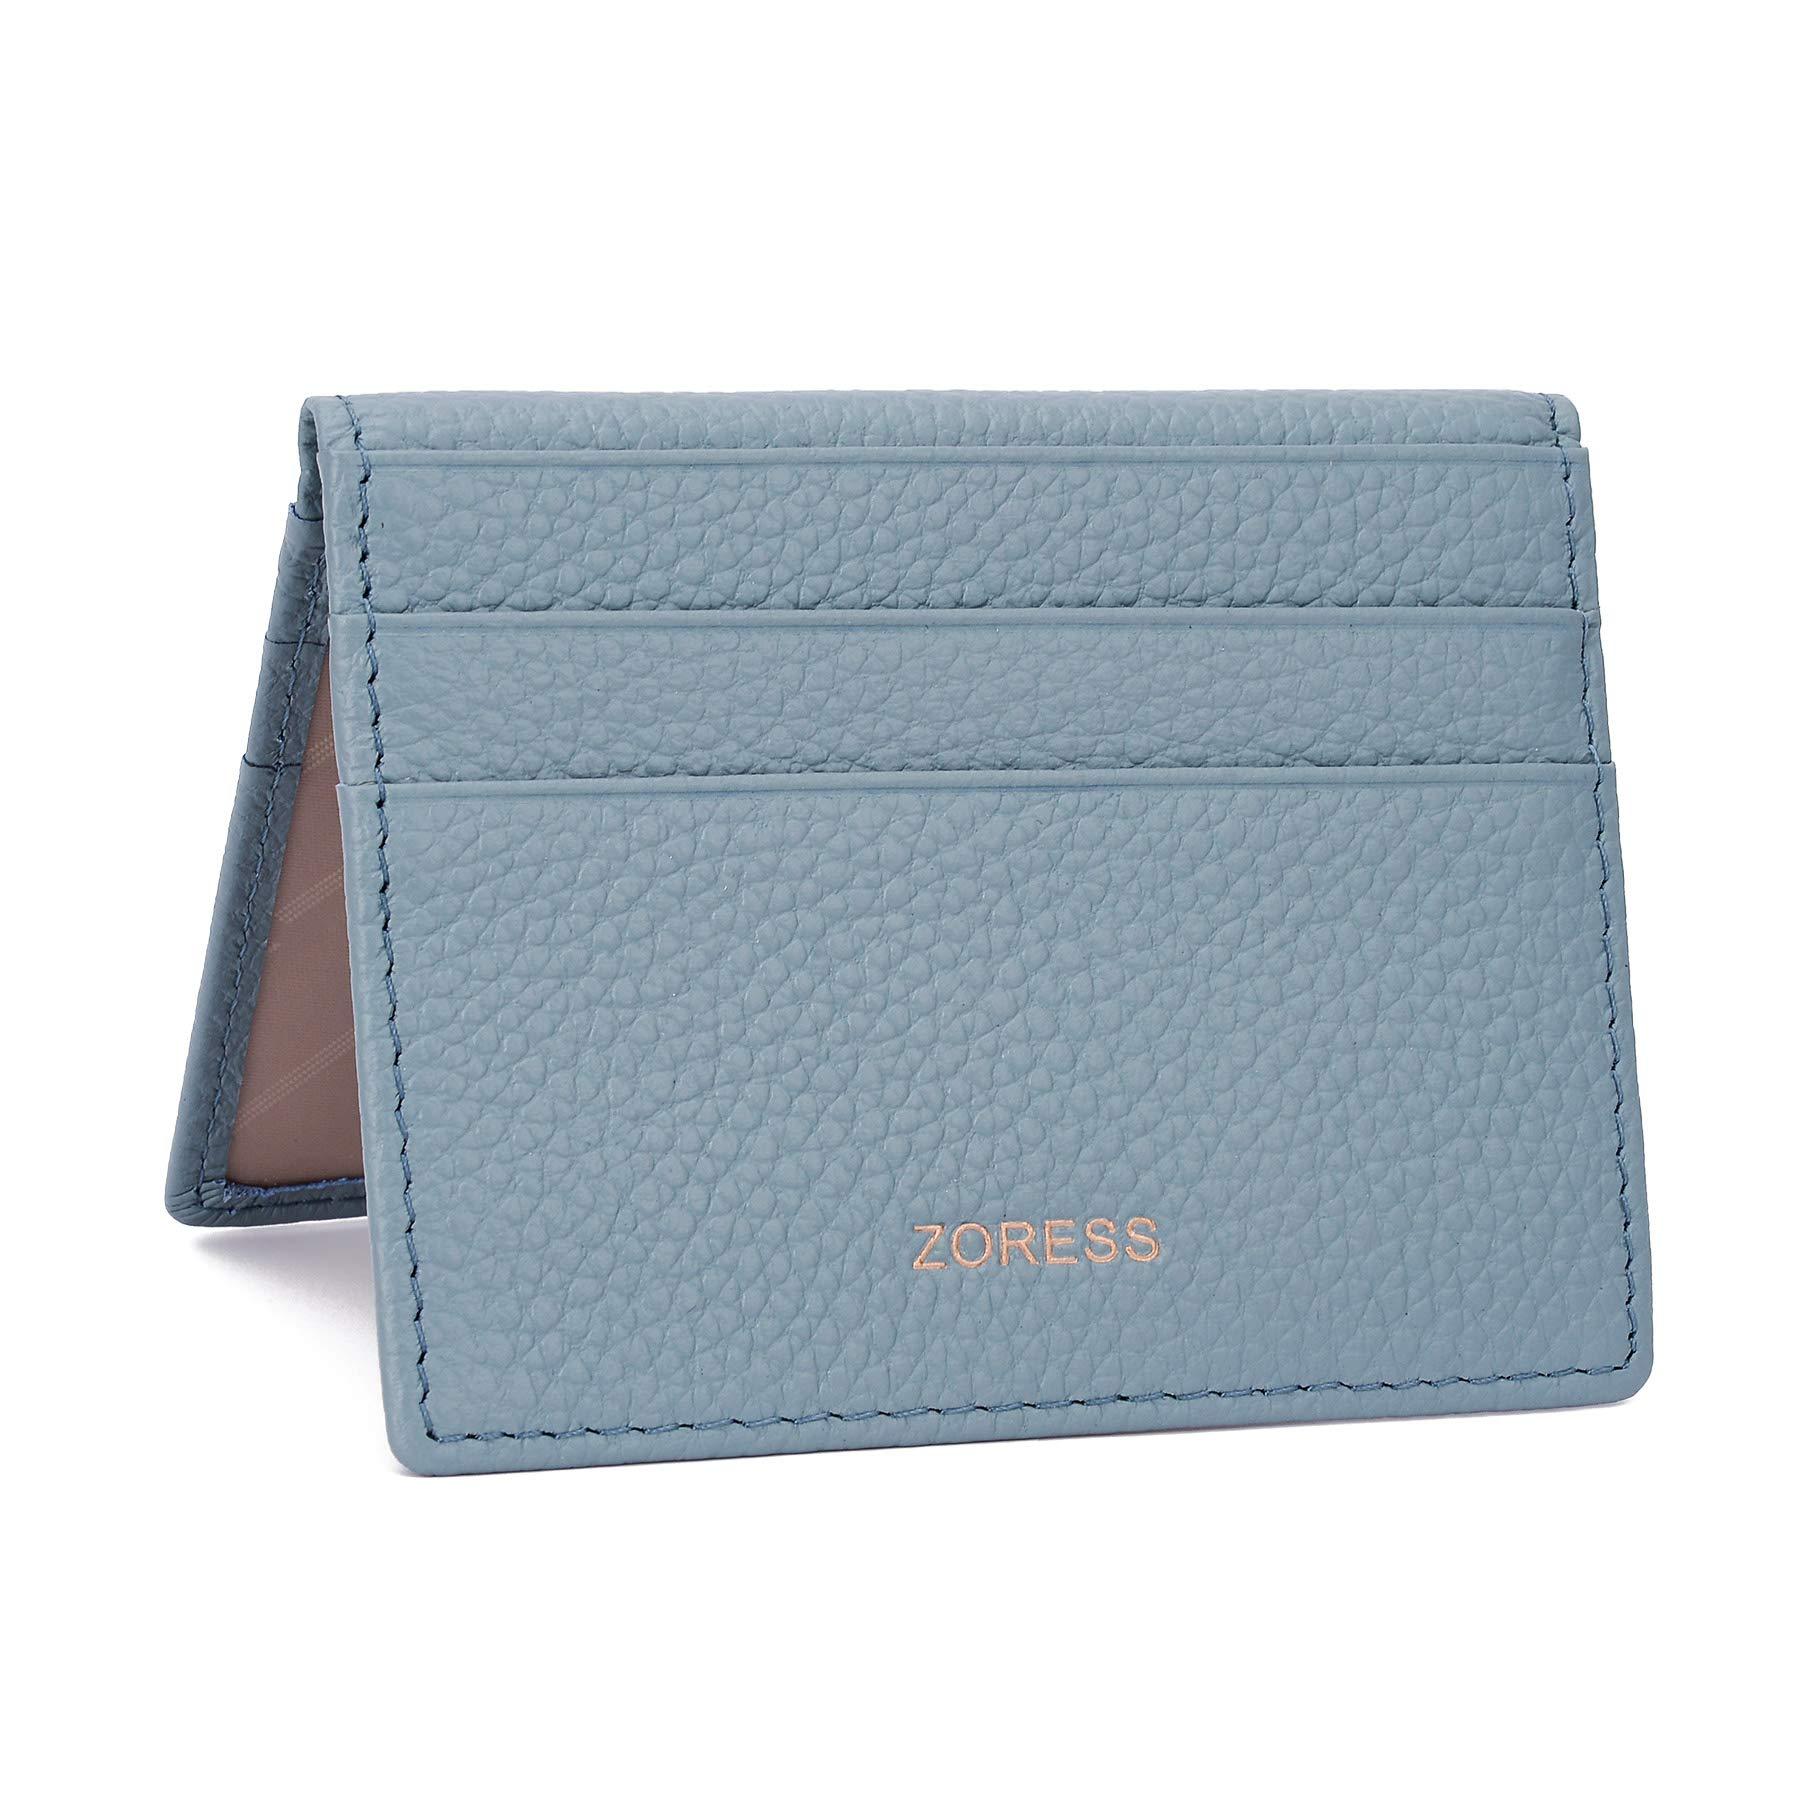 ZORESS Womens Leather RFID Blocking Slim Credit Card Case Holder Travel Front Pocket Wallet (Blue)